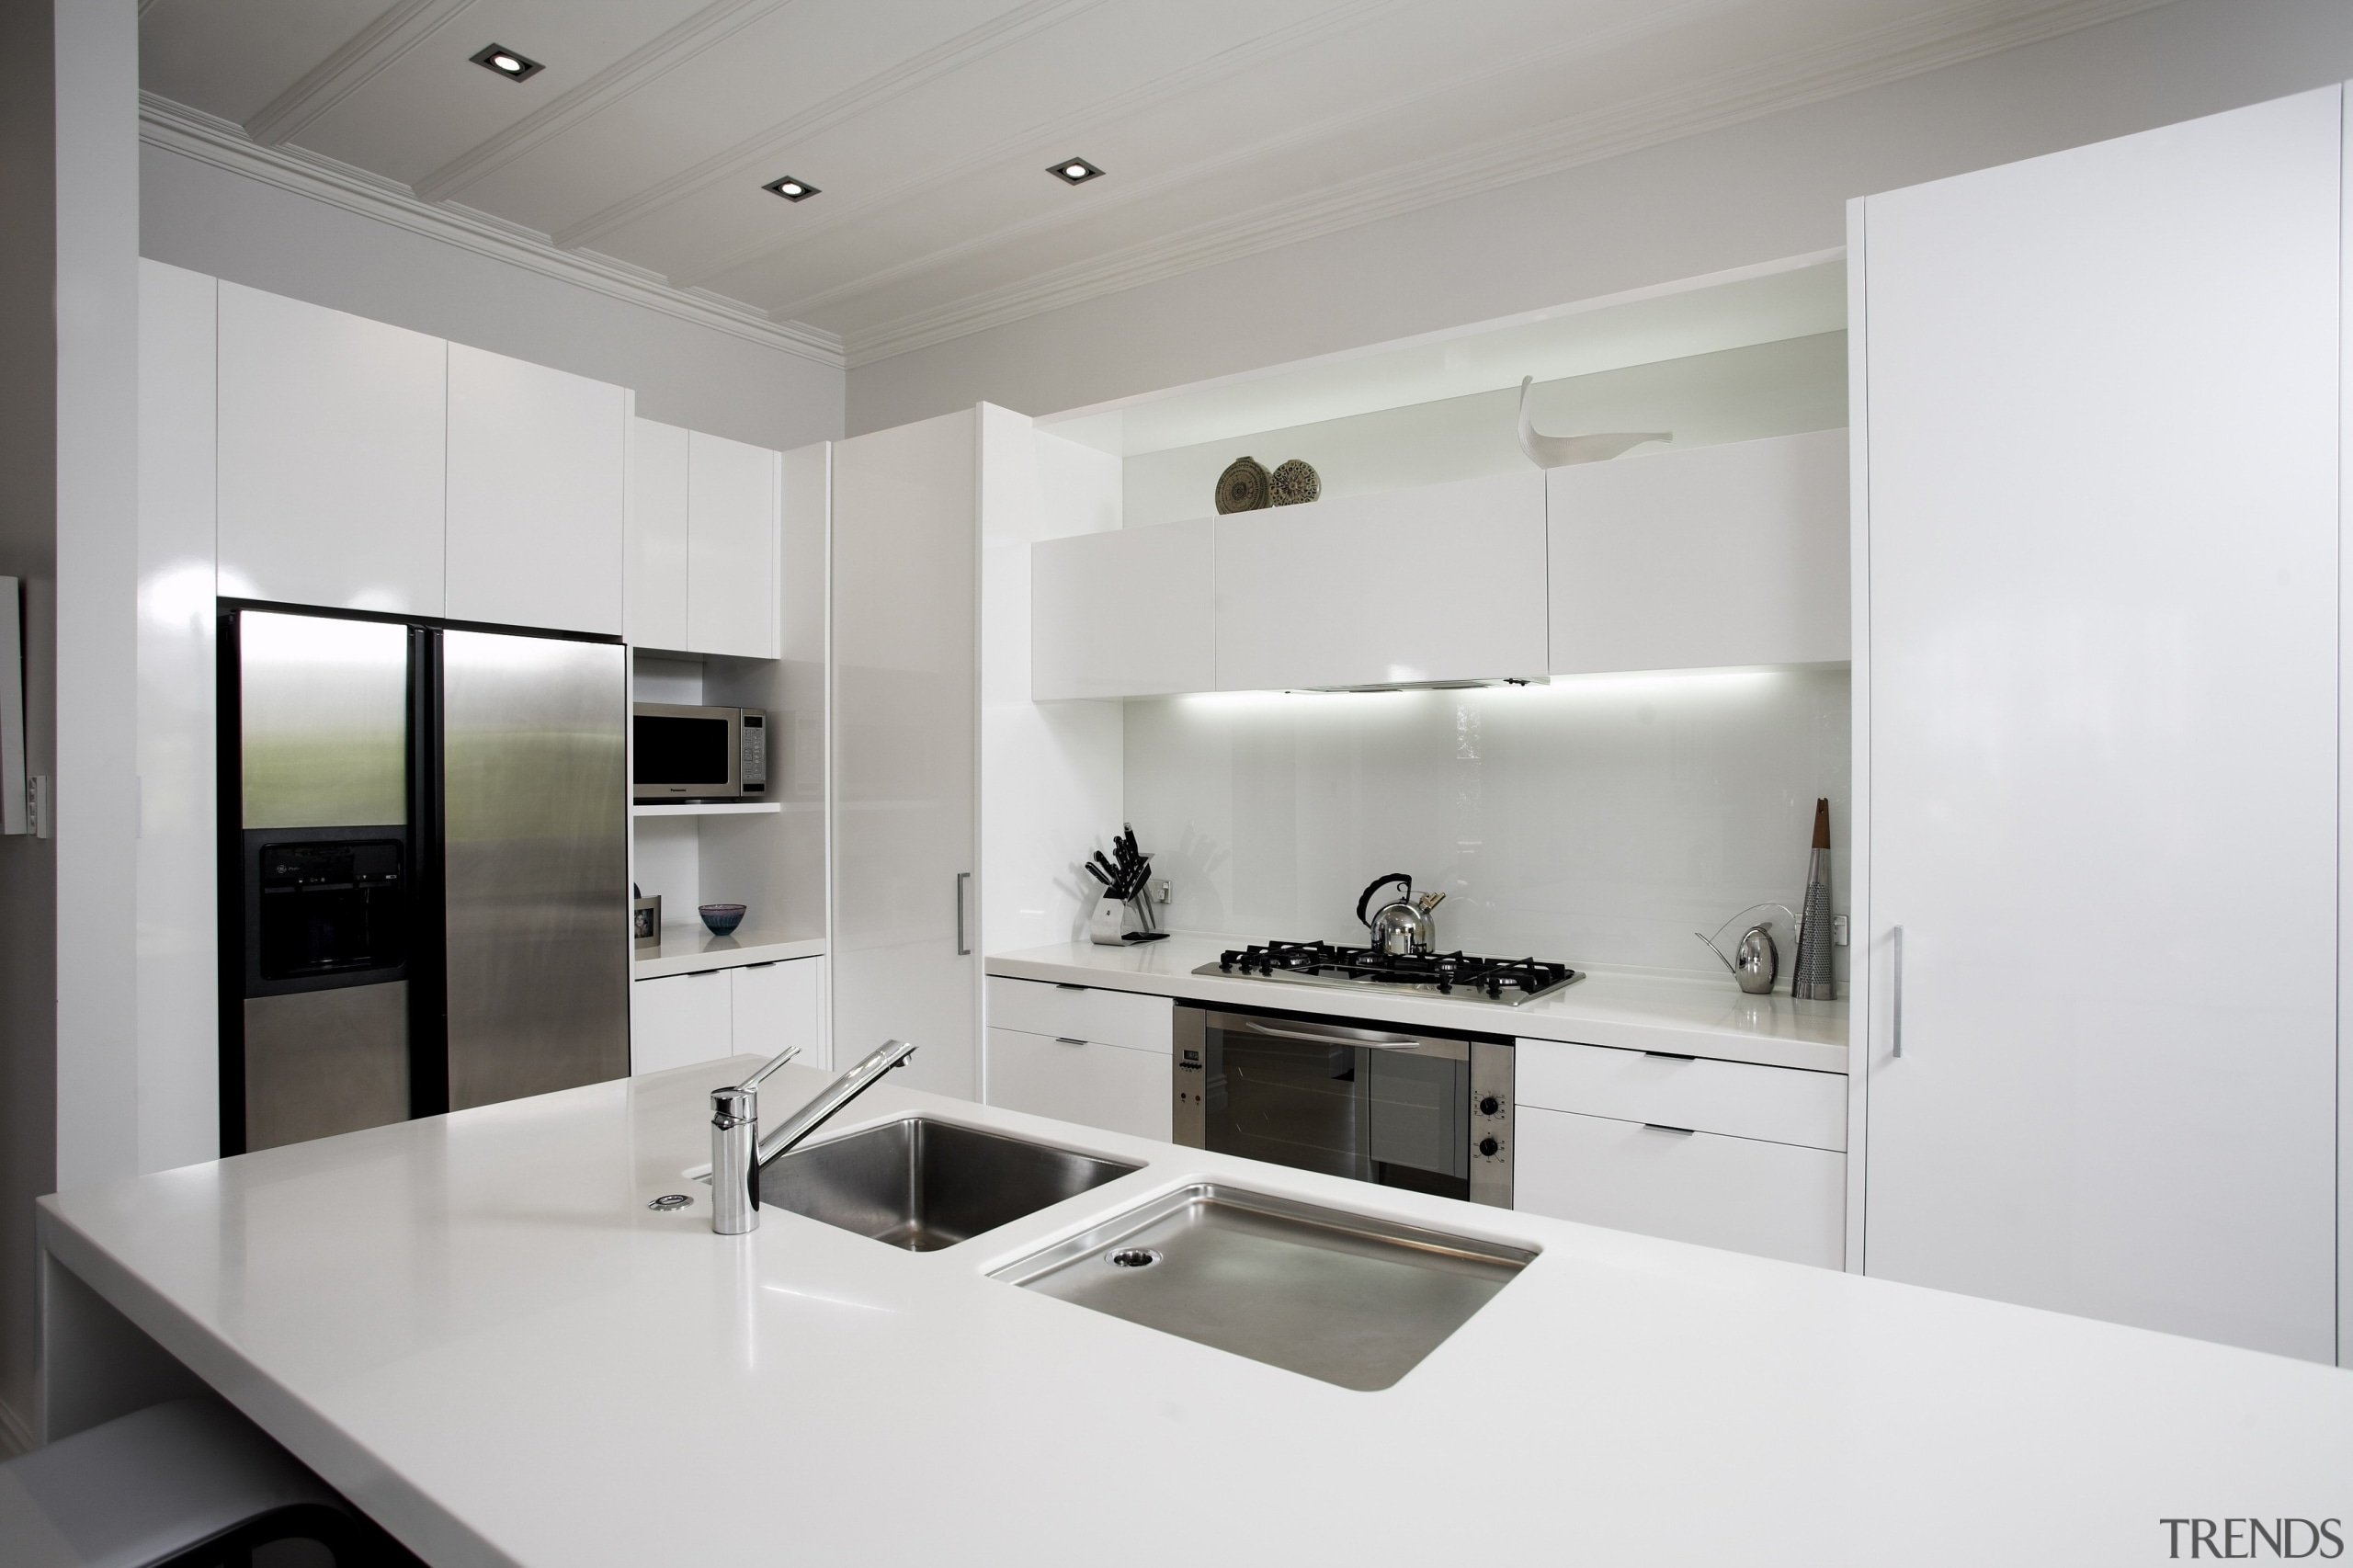 Ponsonby - countertop | cuisine classique | home countertop, cuisine classique, home appliance, interior design, kitchen, real estate, gray, white